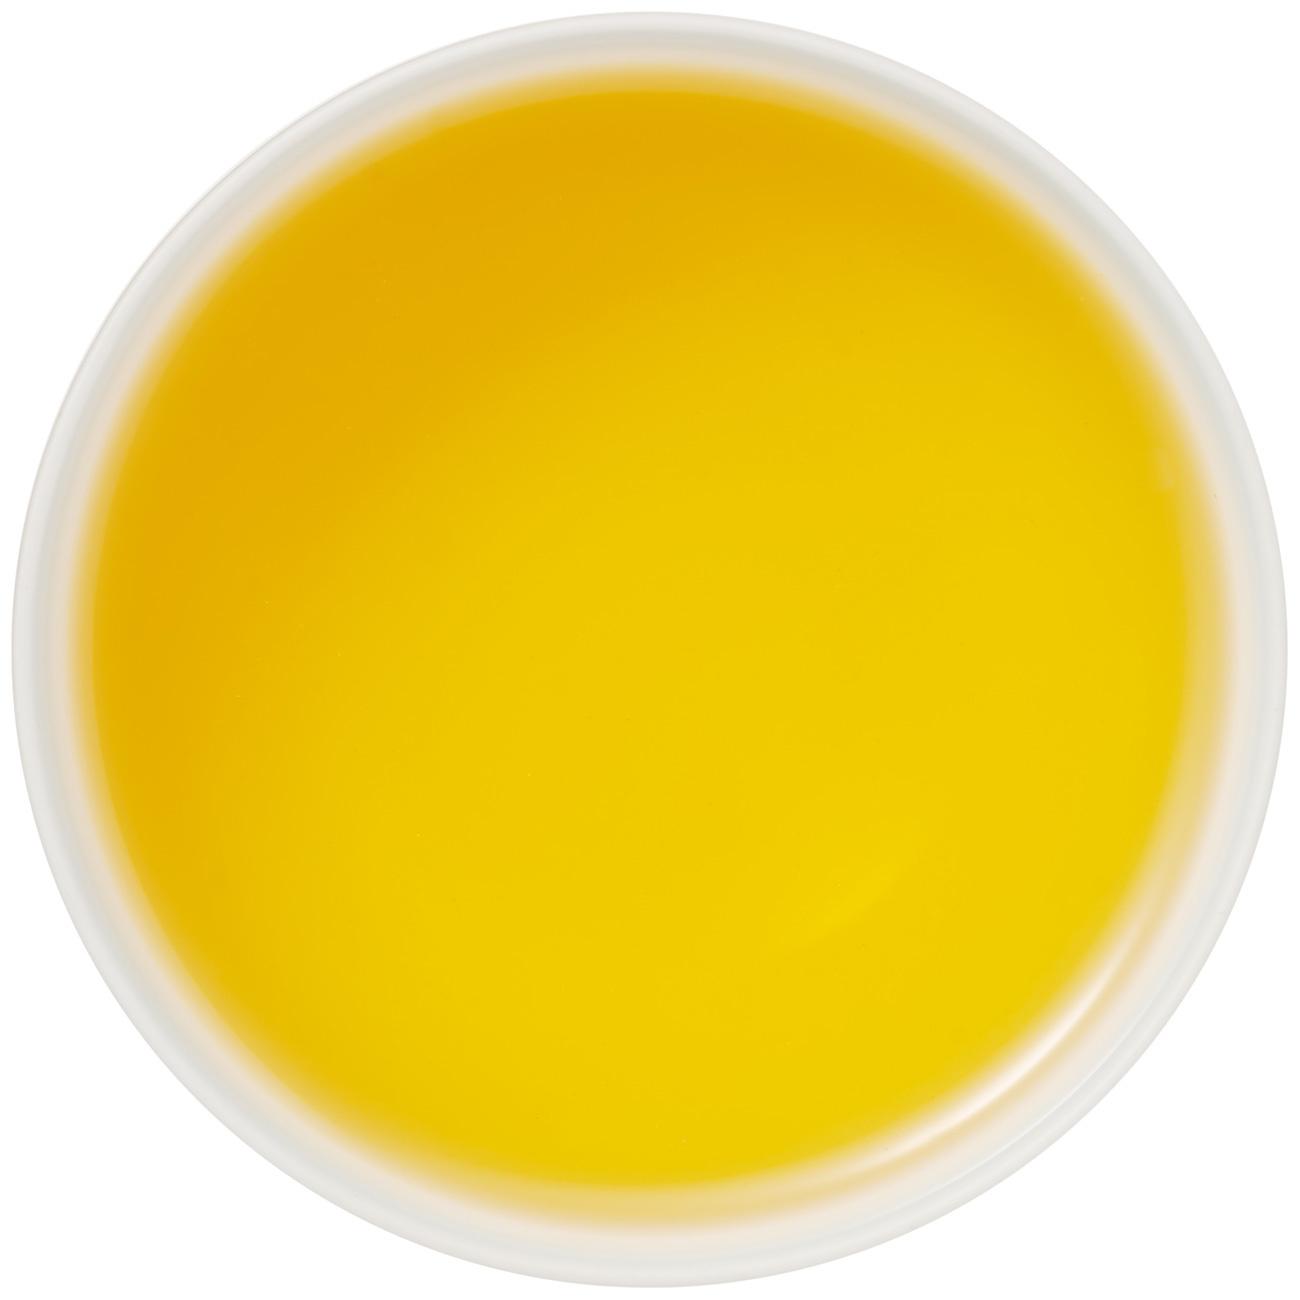 Lemongrass, grof gesneden thee